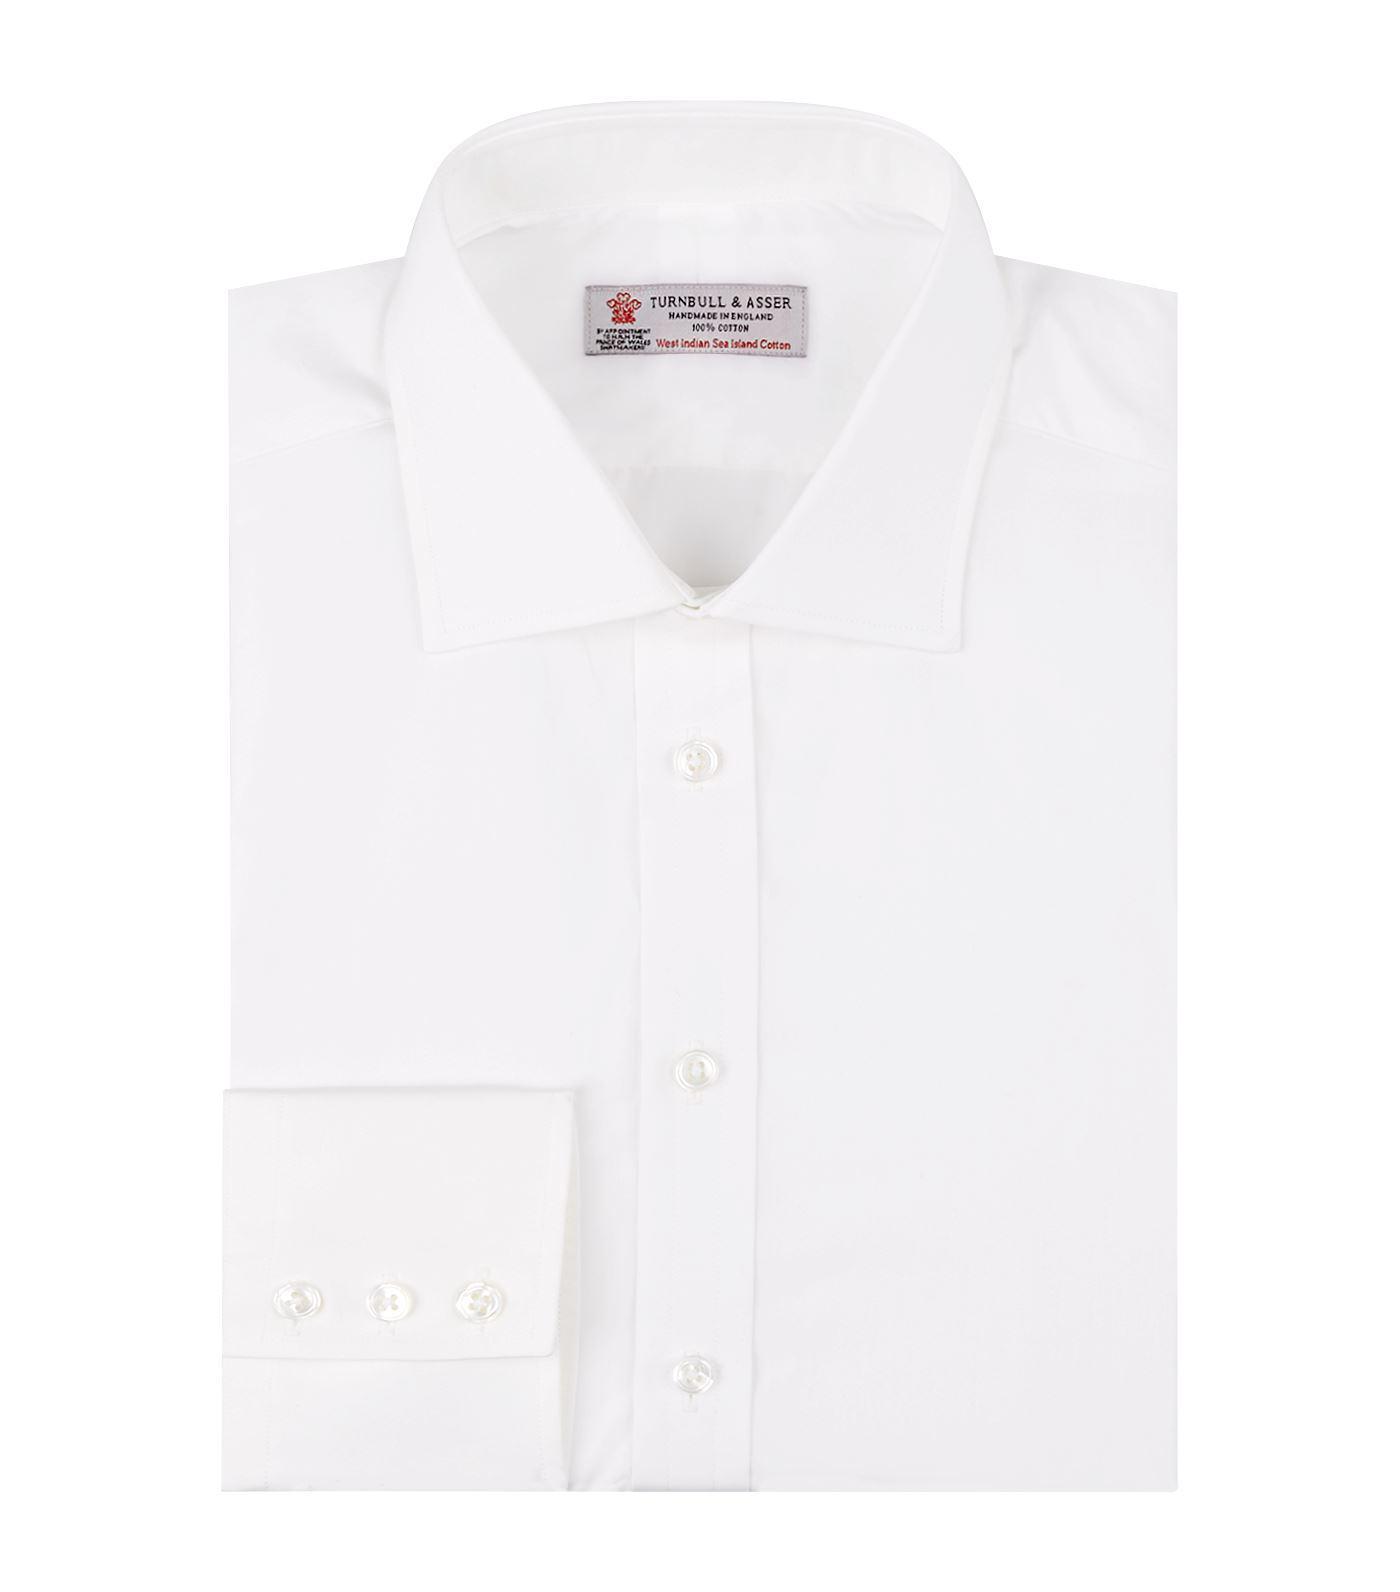 Lyst Turnbull Asser Sea Island Cotton Shirt In White For Men